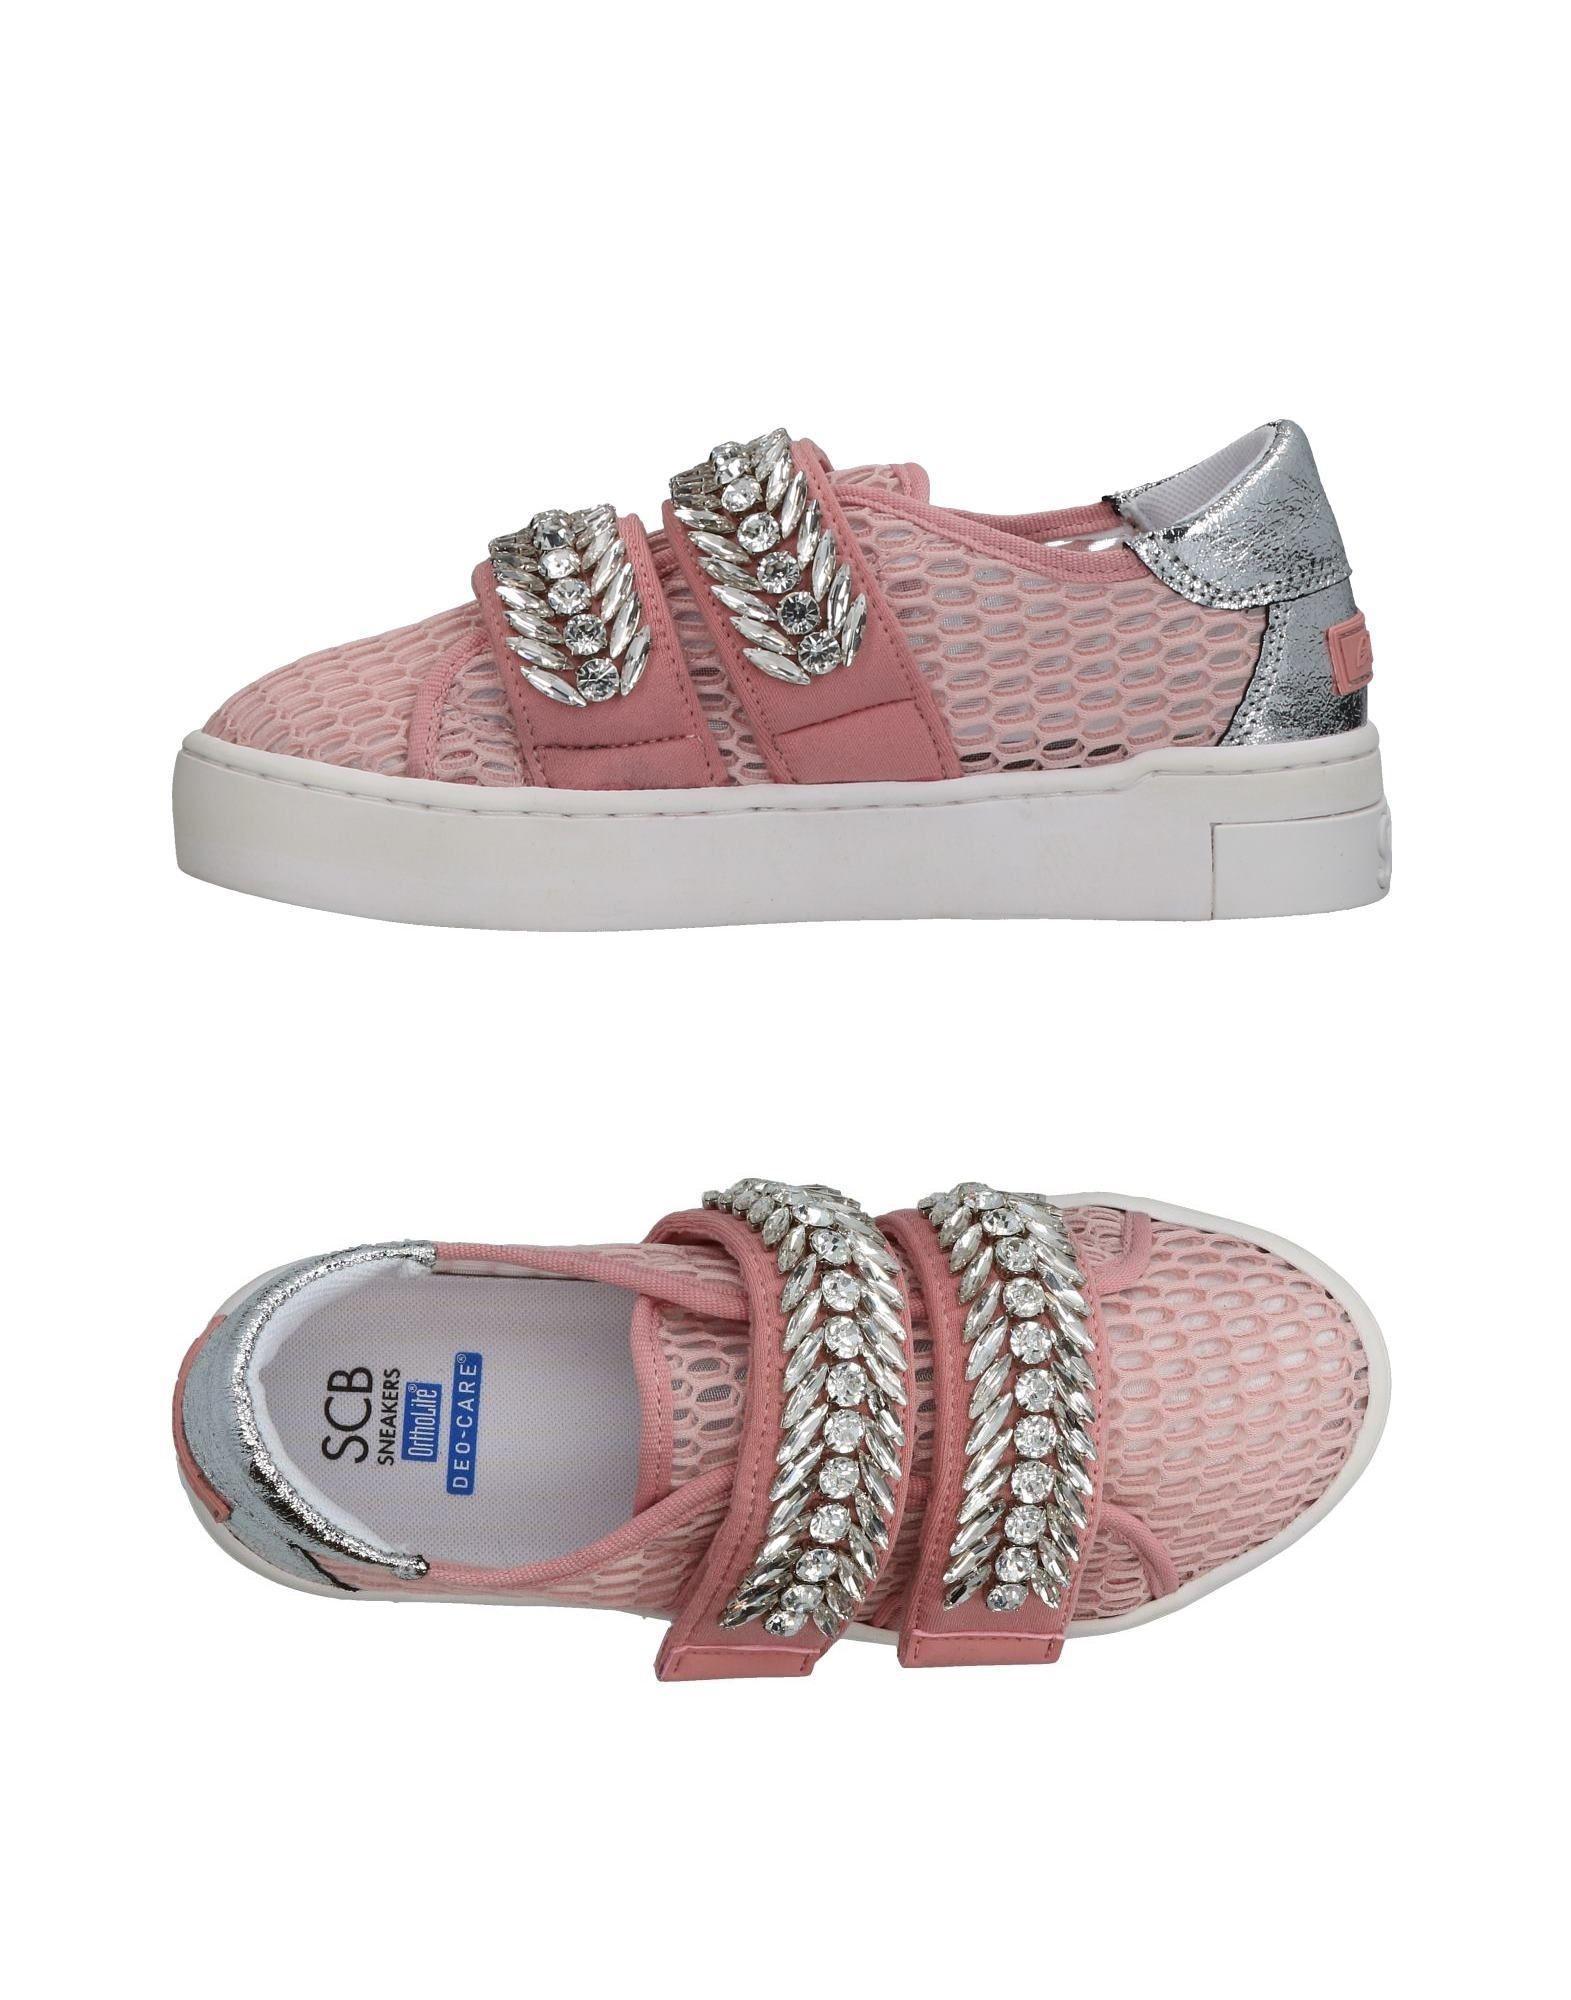 FOOTWEAR - Low-tops & sneakers on YOOX.COM Suecomma Bonnie E2HLjC105